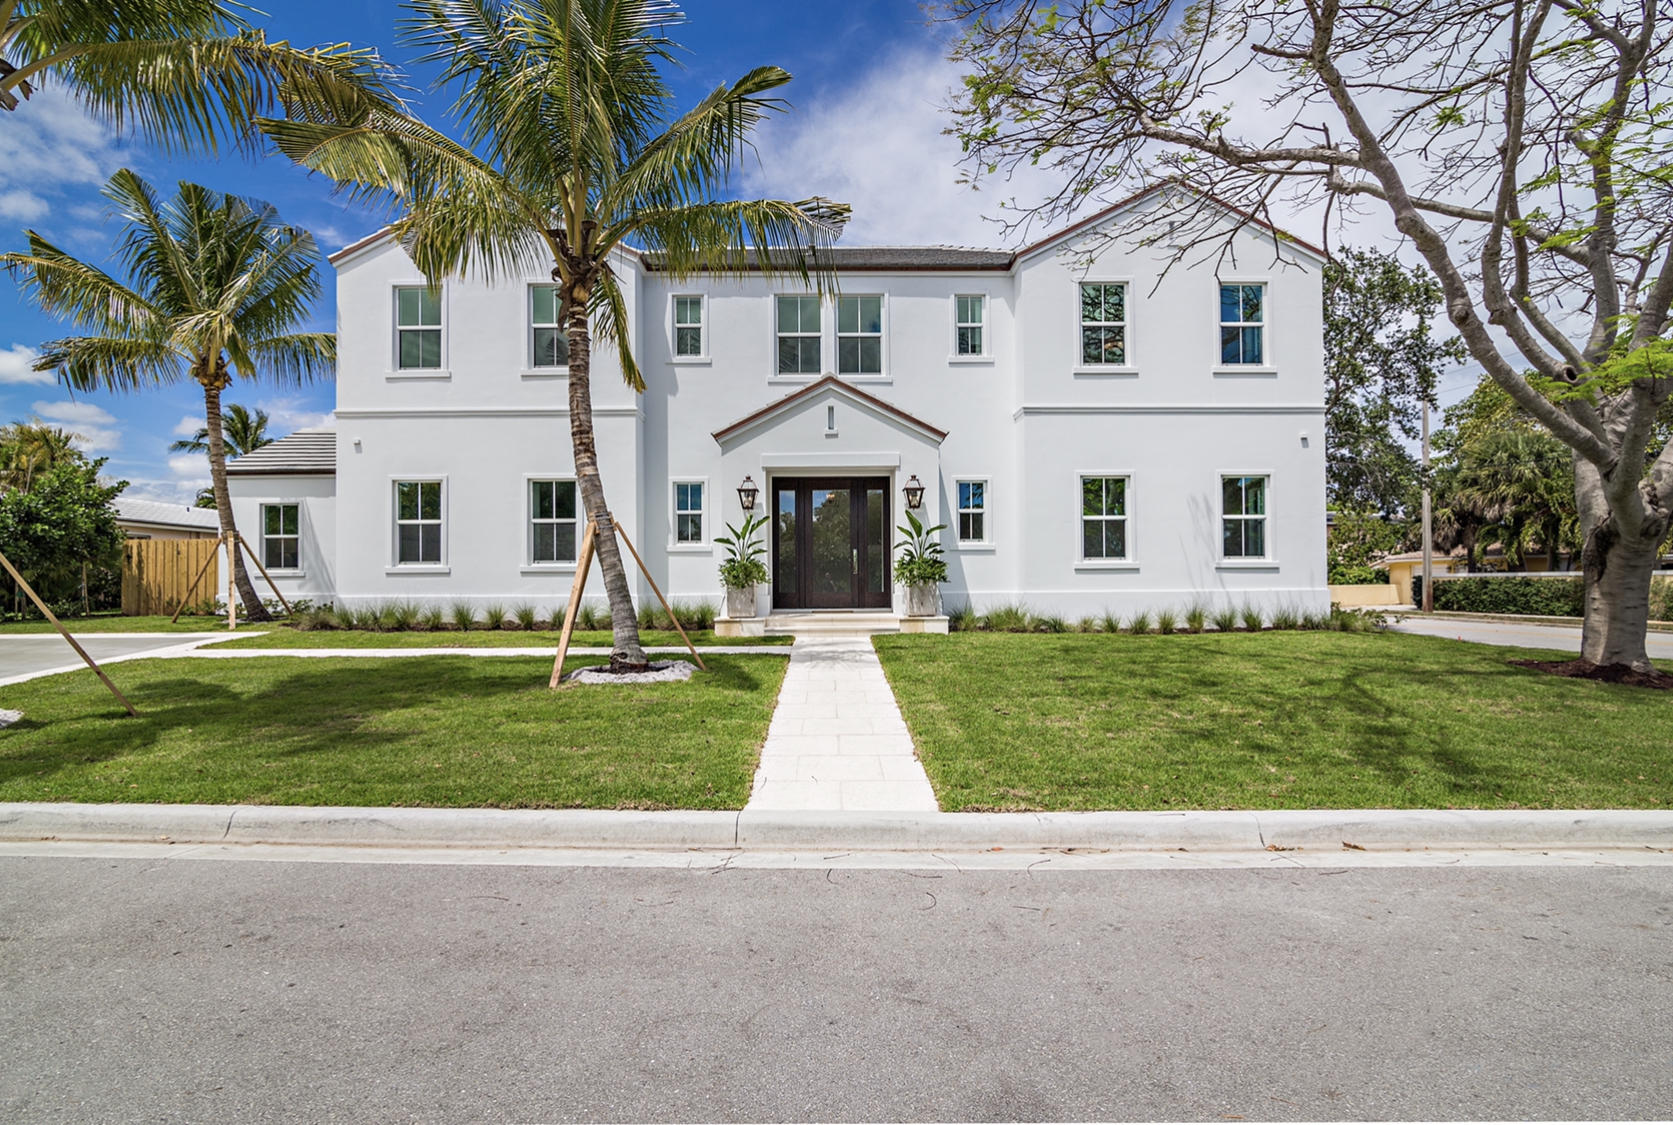 201 Miramar Way, West Palm Beach, Florida 33405, 5 Bedrooms Bedrooms, ,5.1 BathroomsBathrooms,Single Family,For Sale,Miramar,RX-10521363